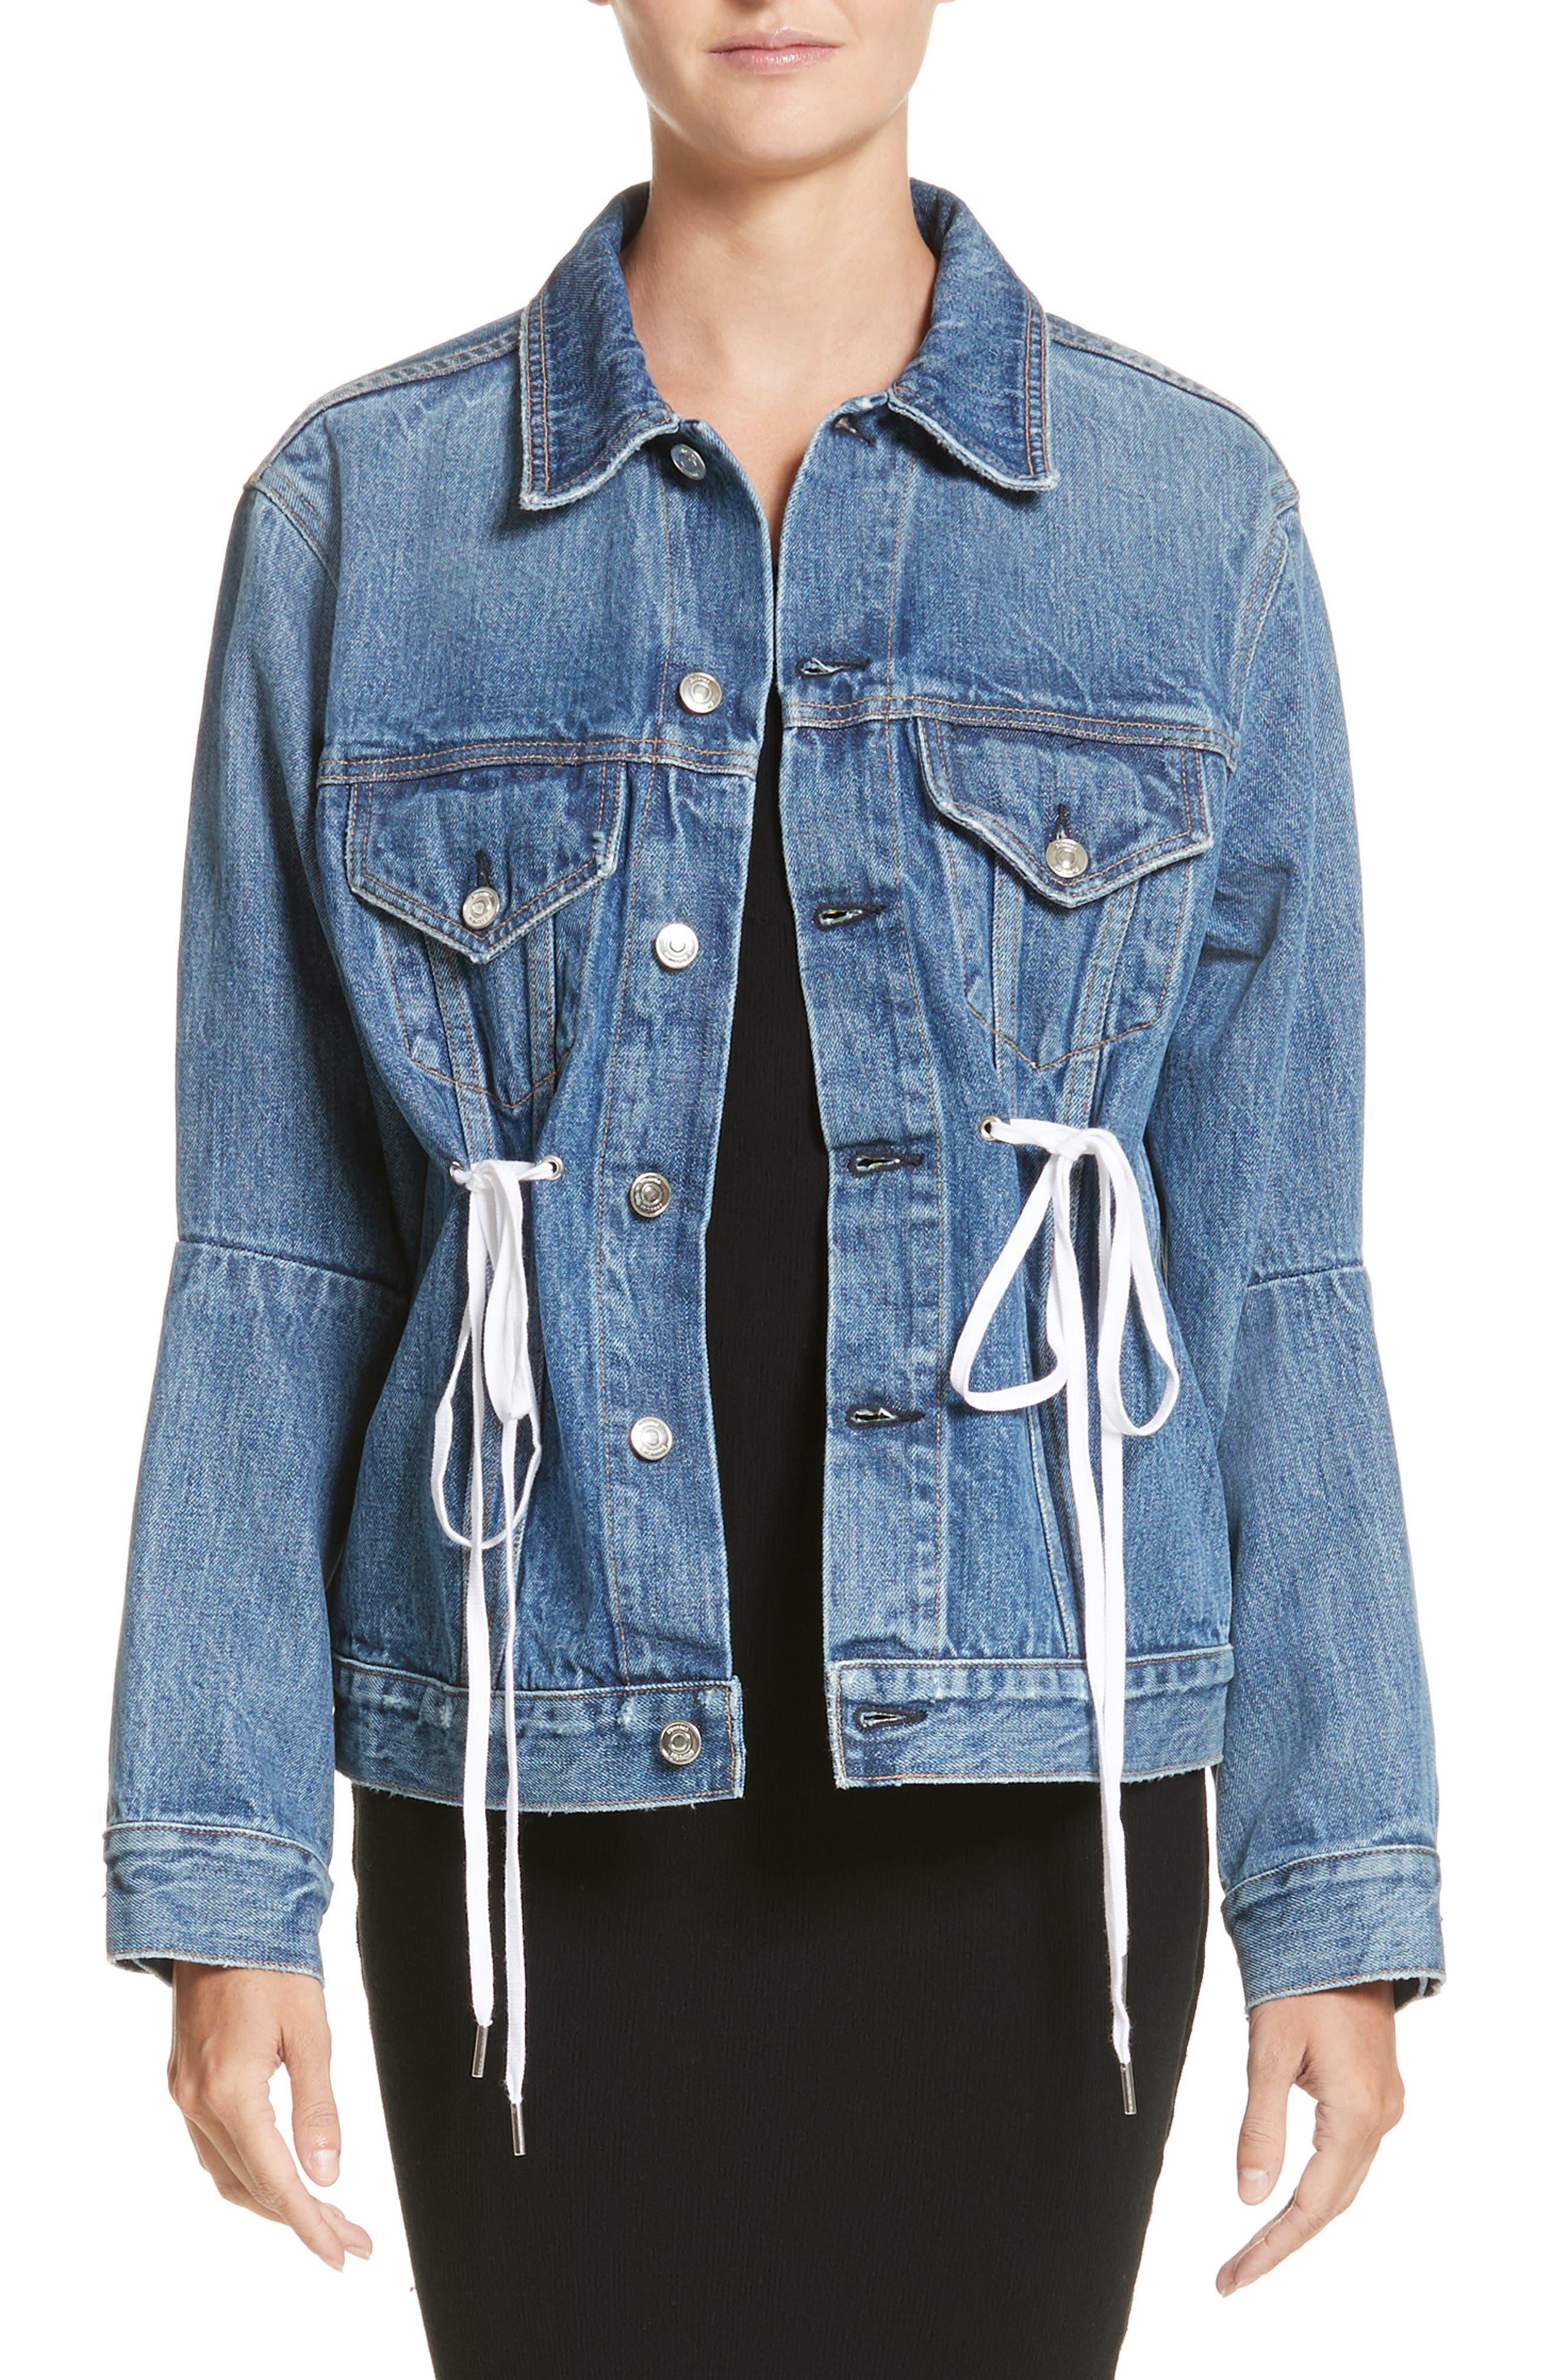 Proenza Schouler PSWL Drawstring Denim Jacket